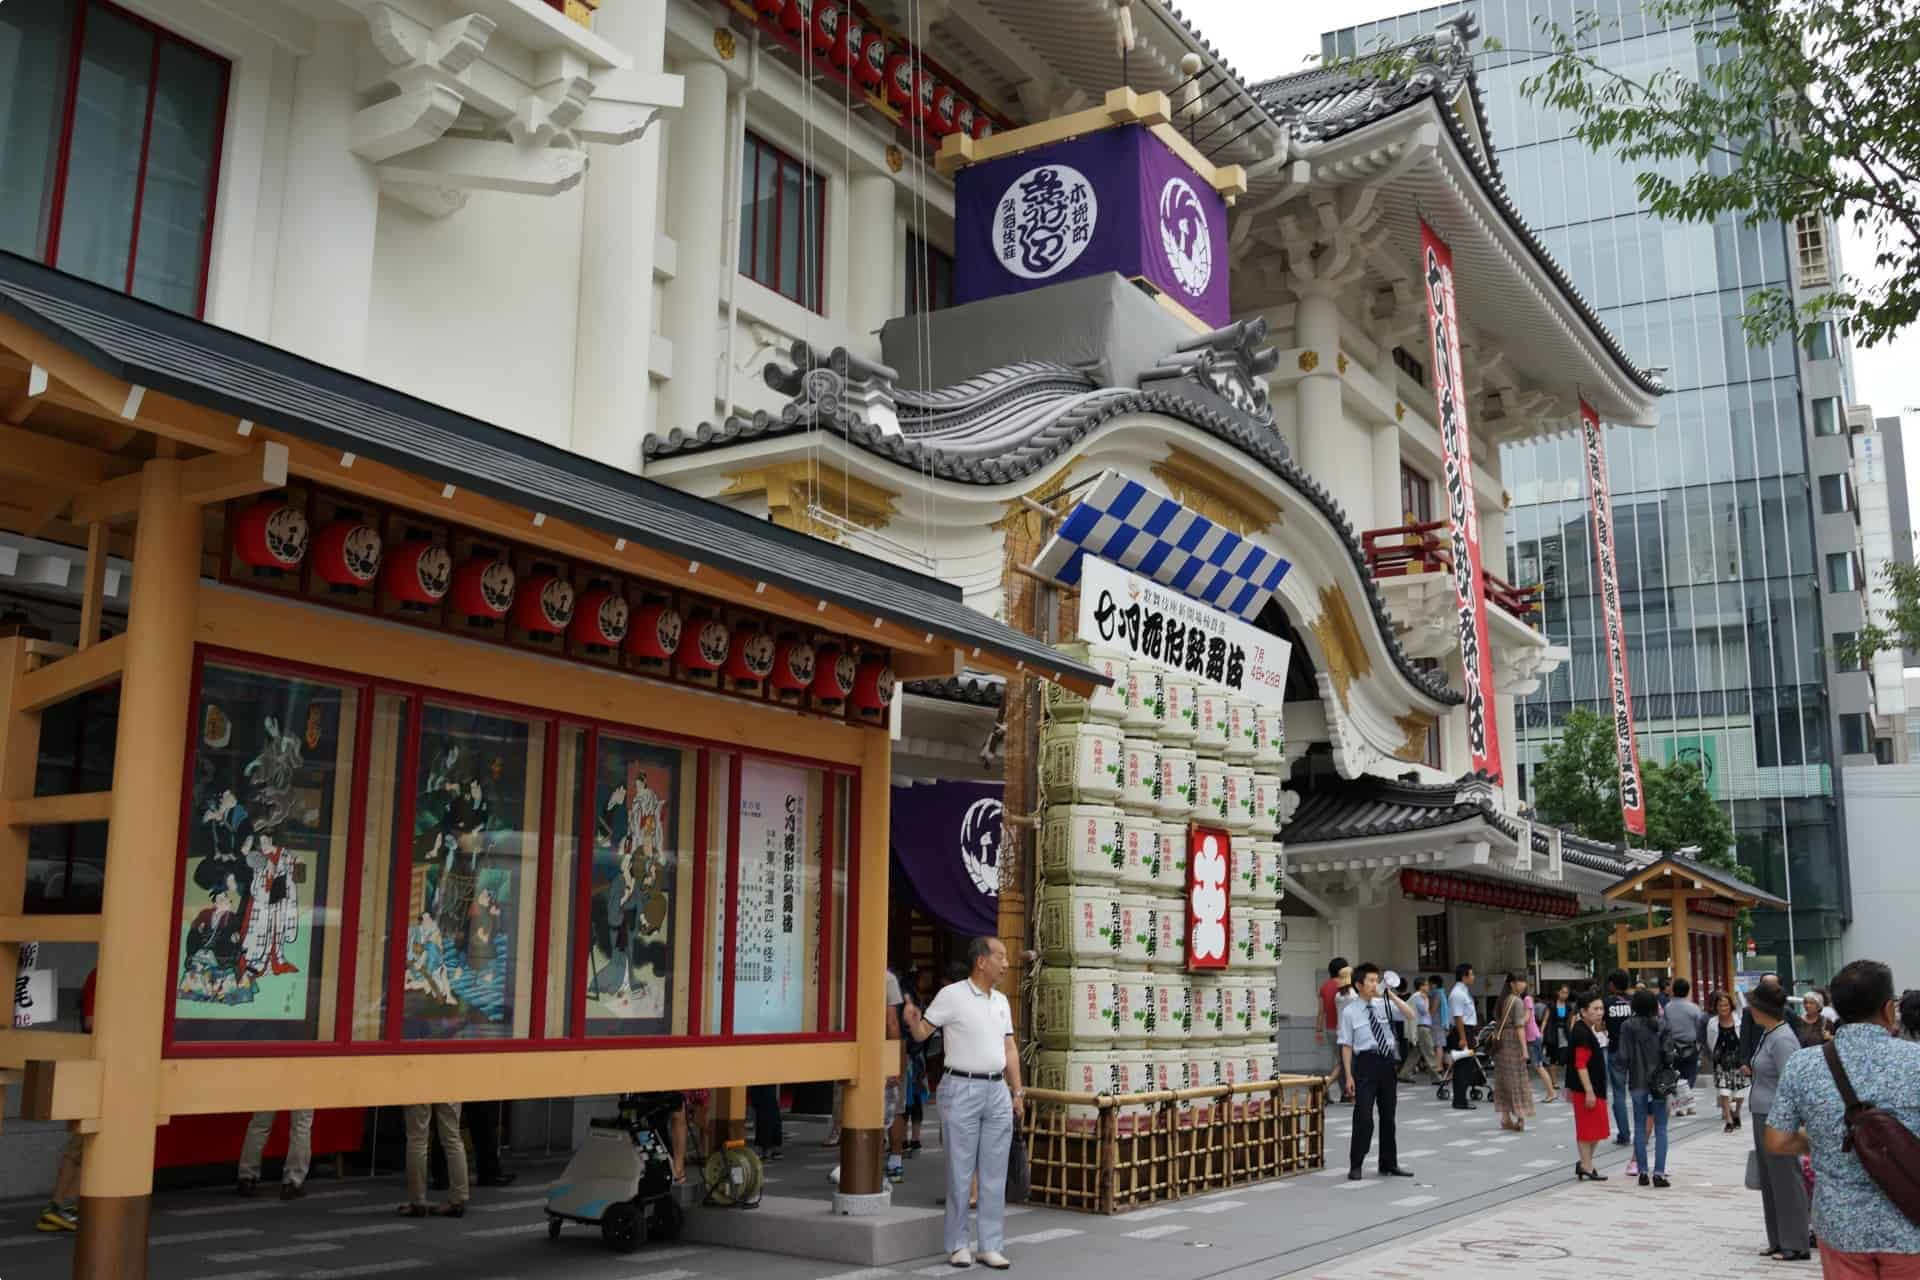 Kabuki-za Theatre in Tokyo